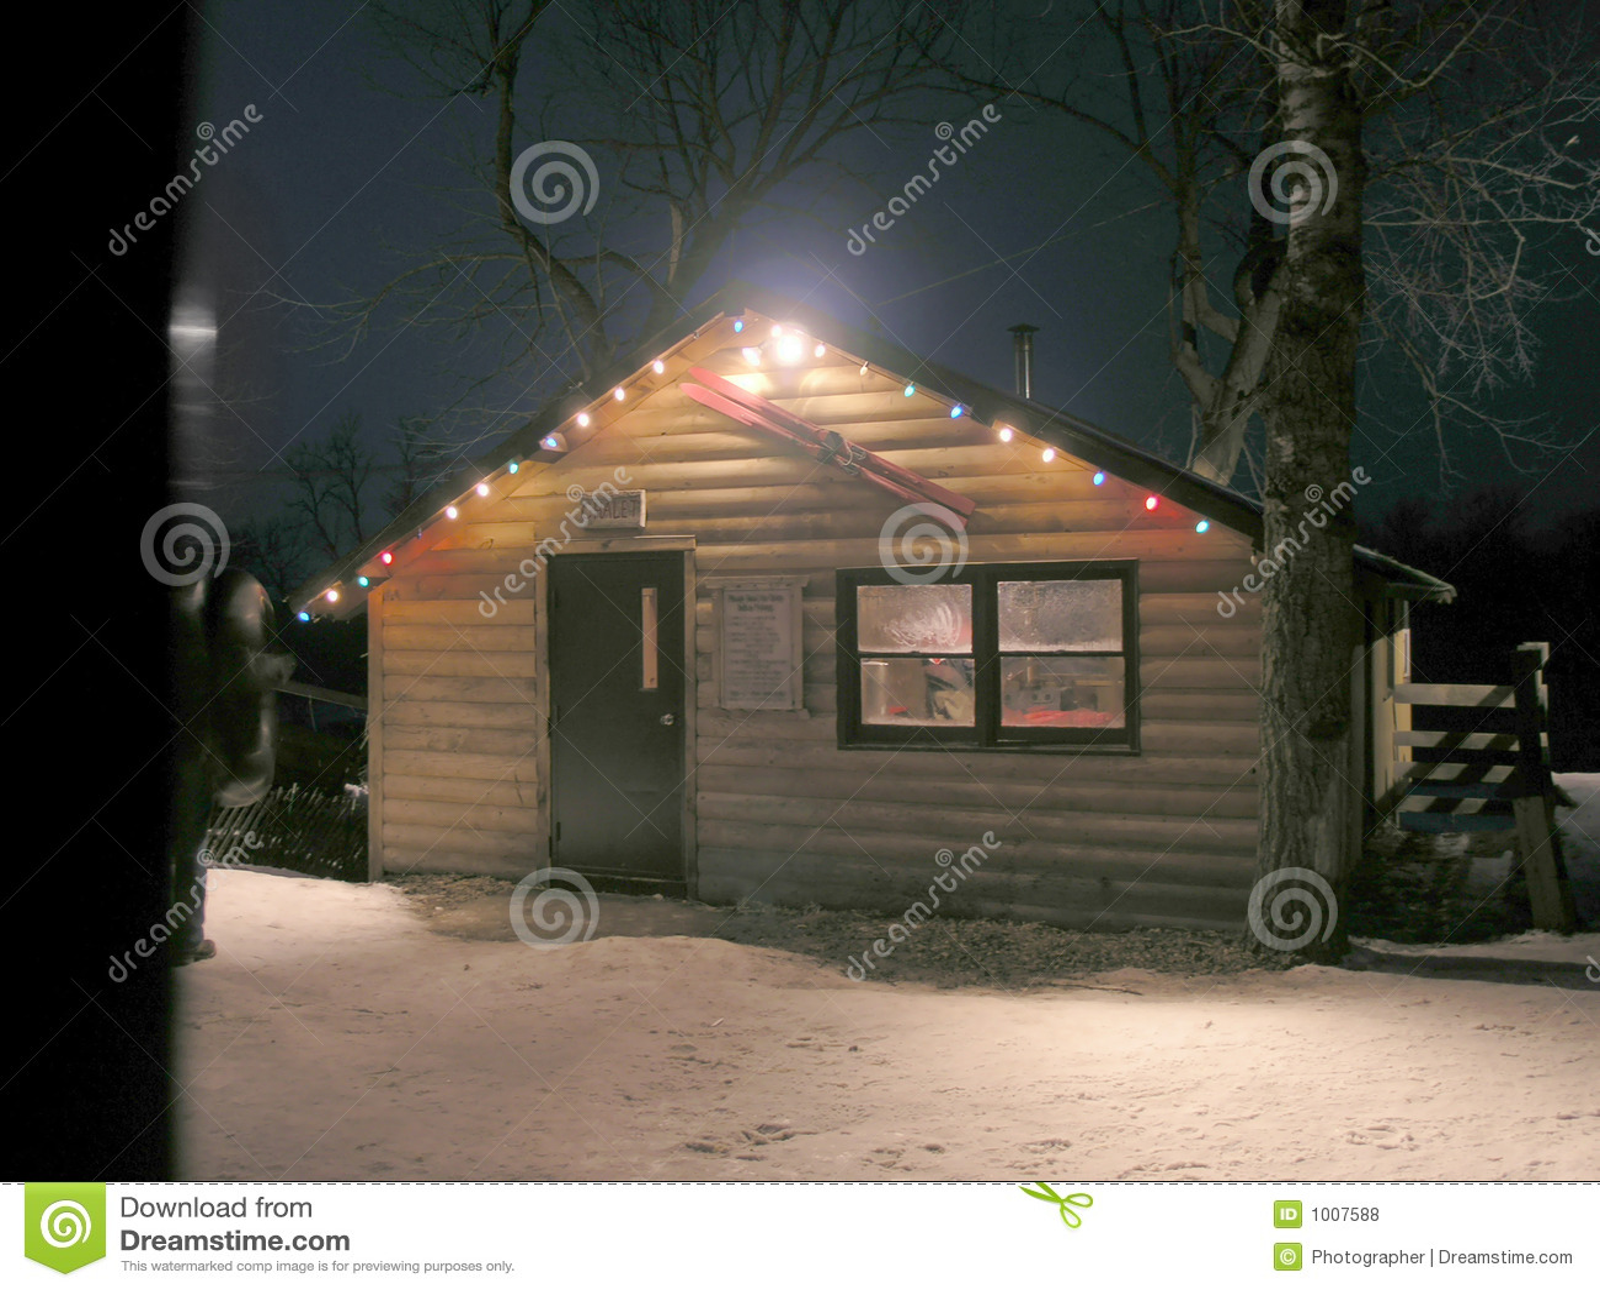 Warming hut at night